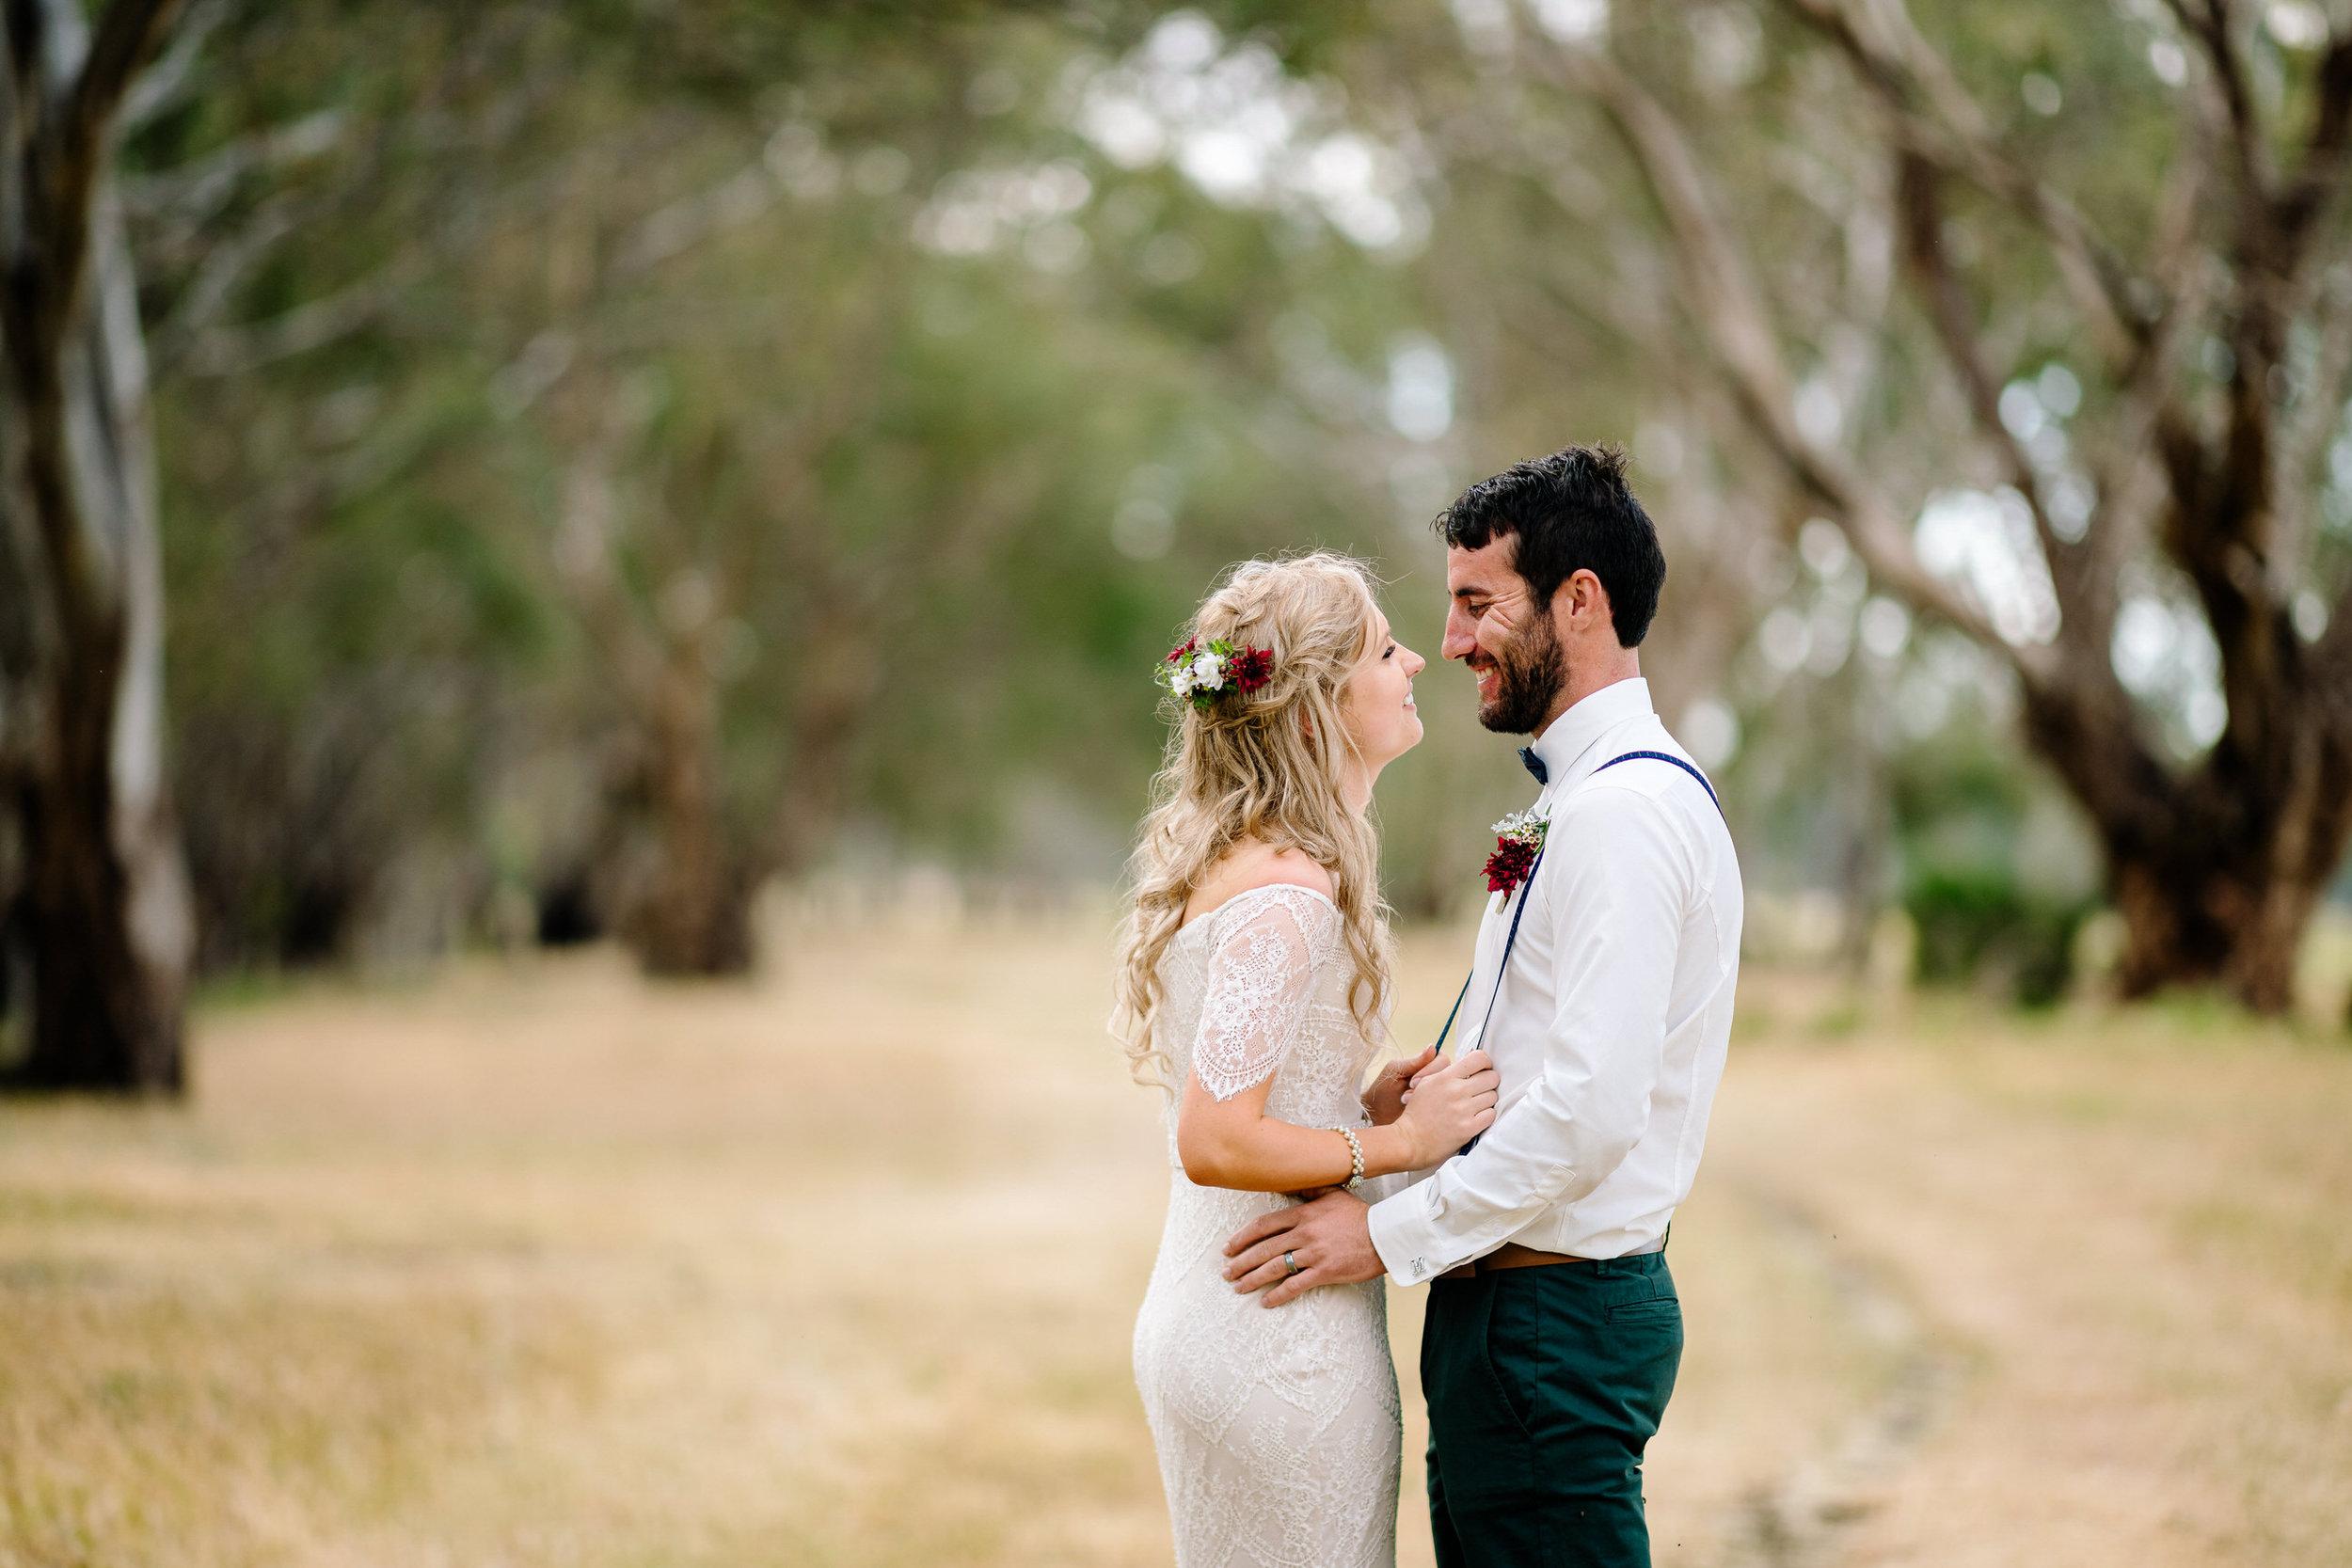 Justin_And_Jim_Photography_Backyard_Wedding208.JPG